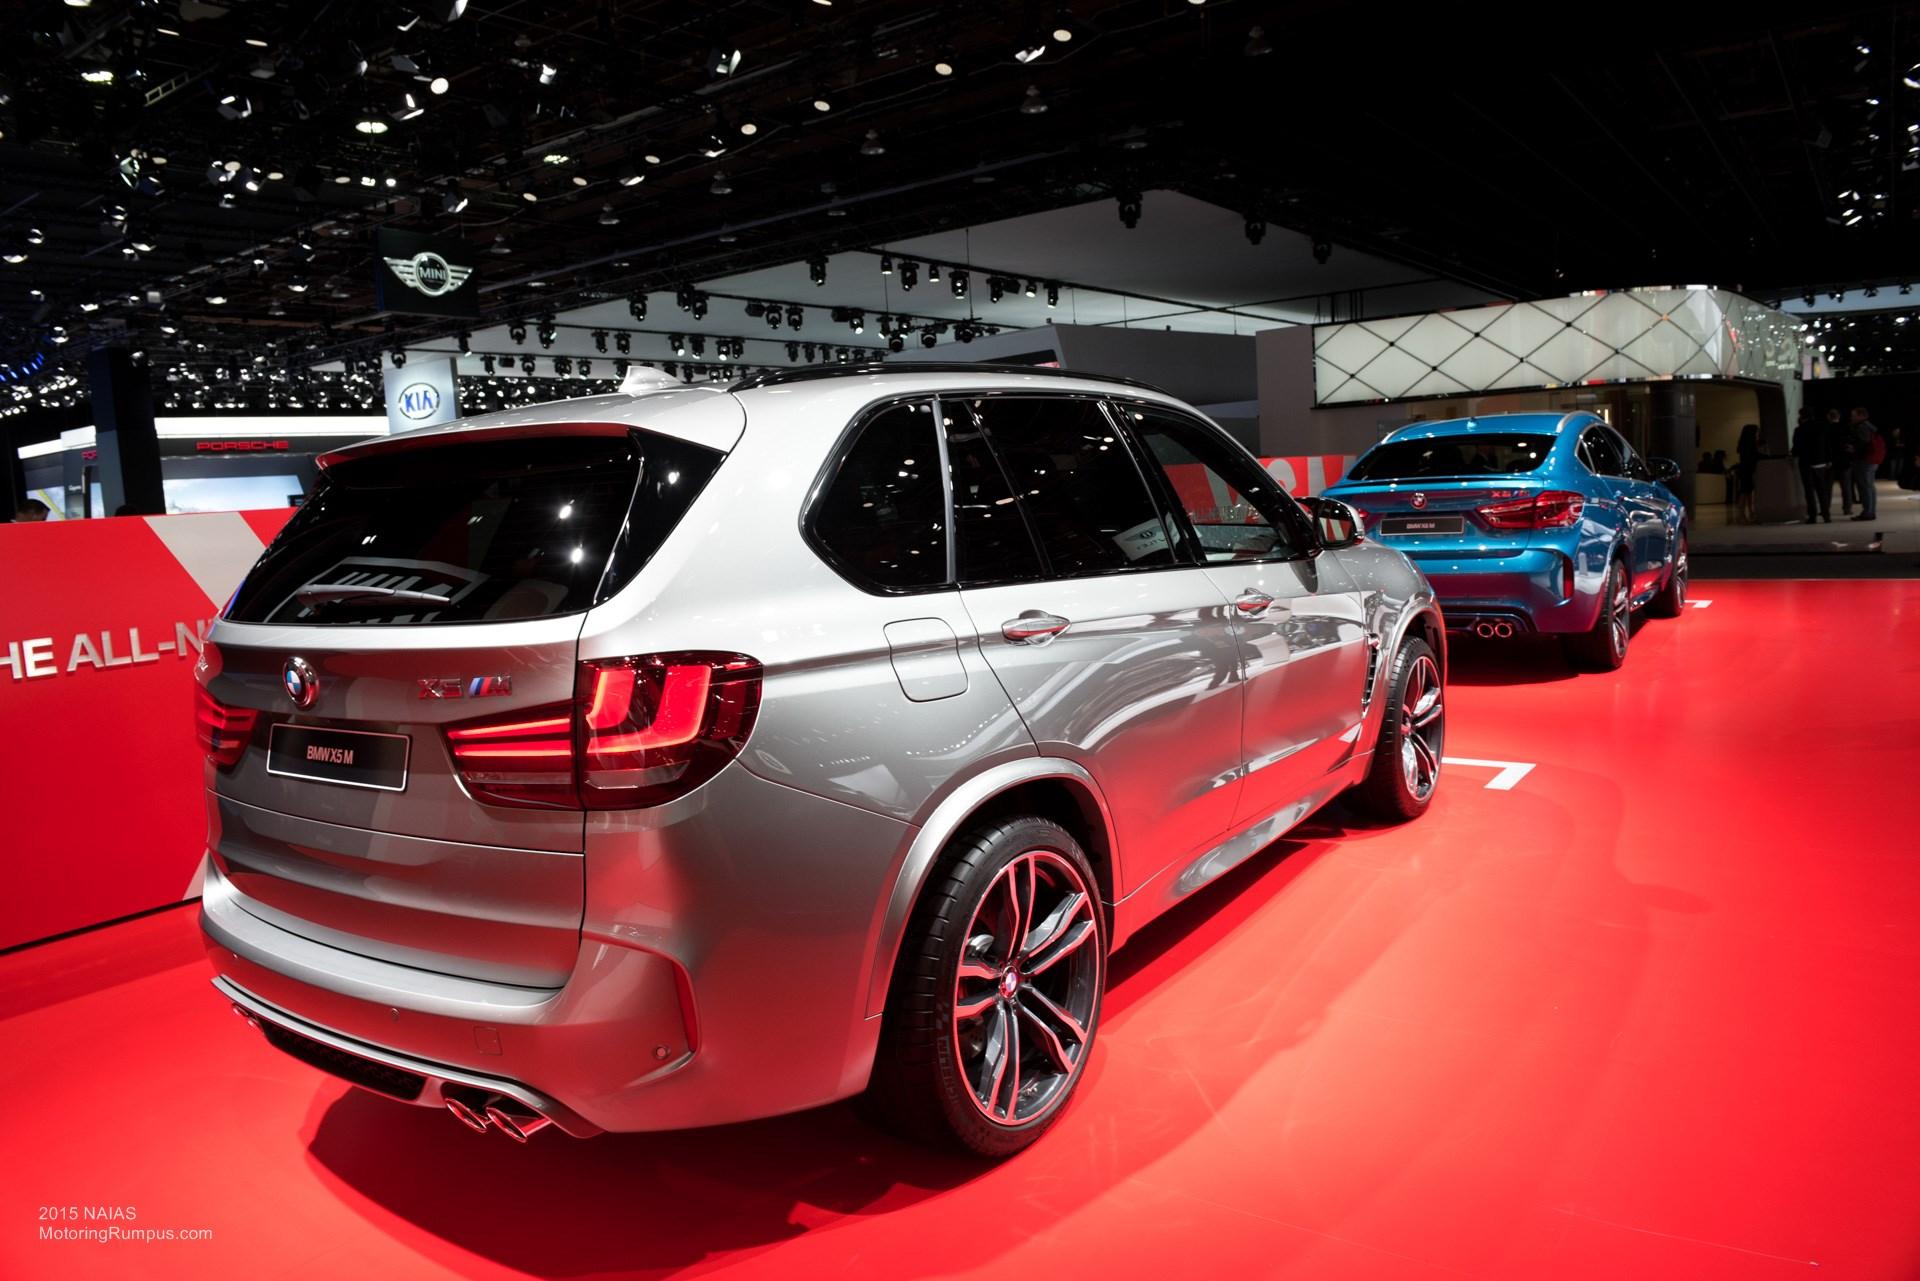 2015 NAIAS BMW X5M